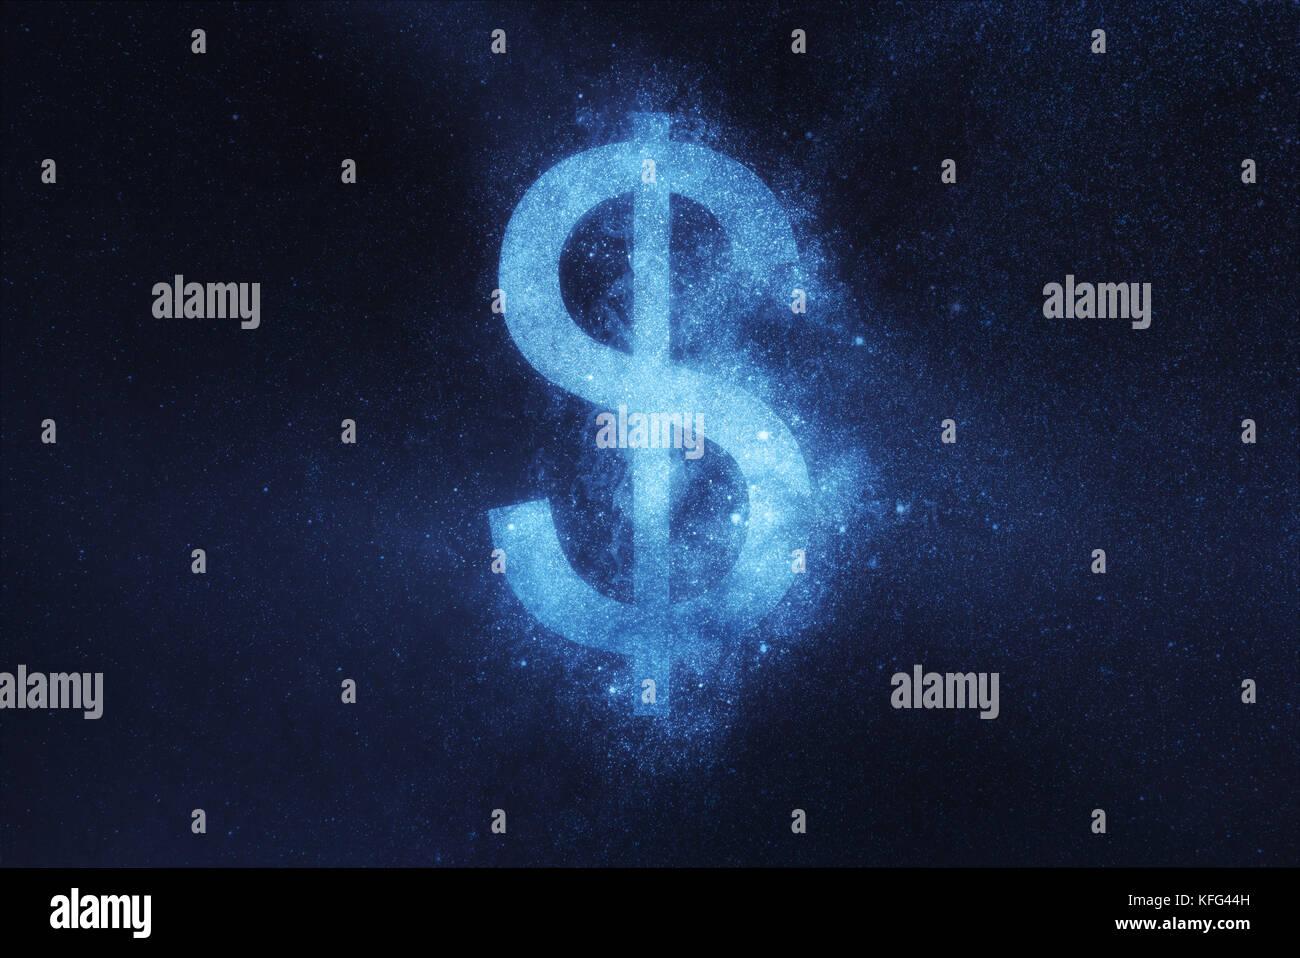 Le symbole du dollar, dollar symbole. Résumé fond de ciel de nuit Photo Stock